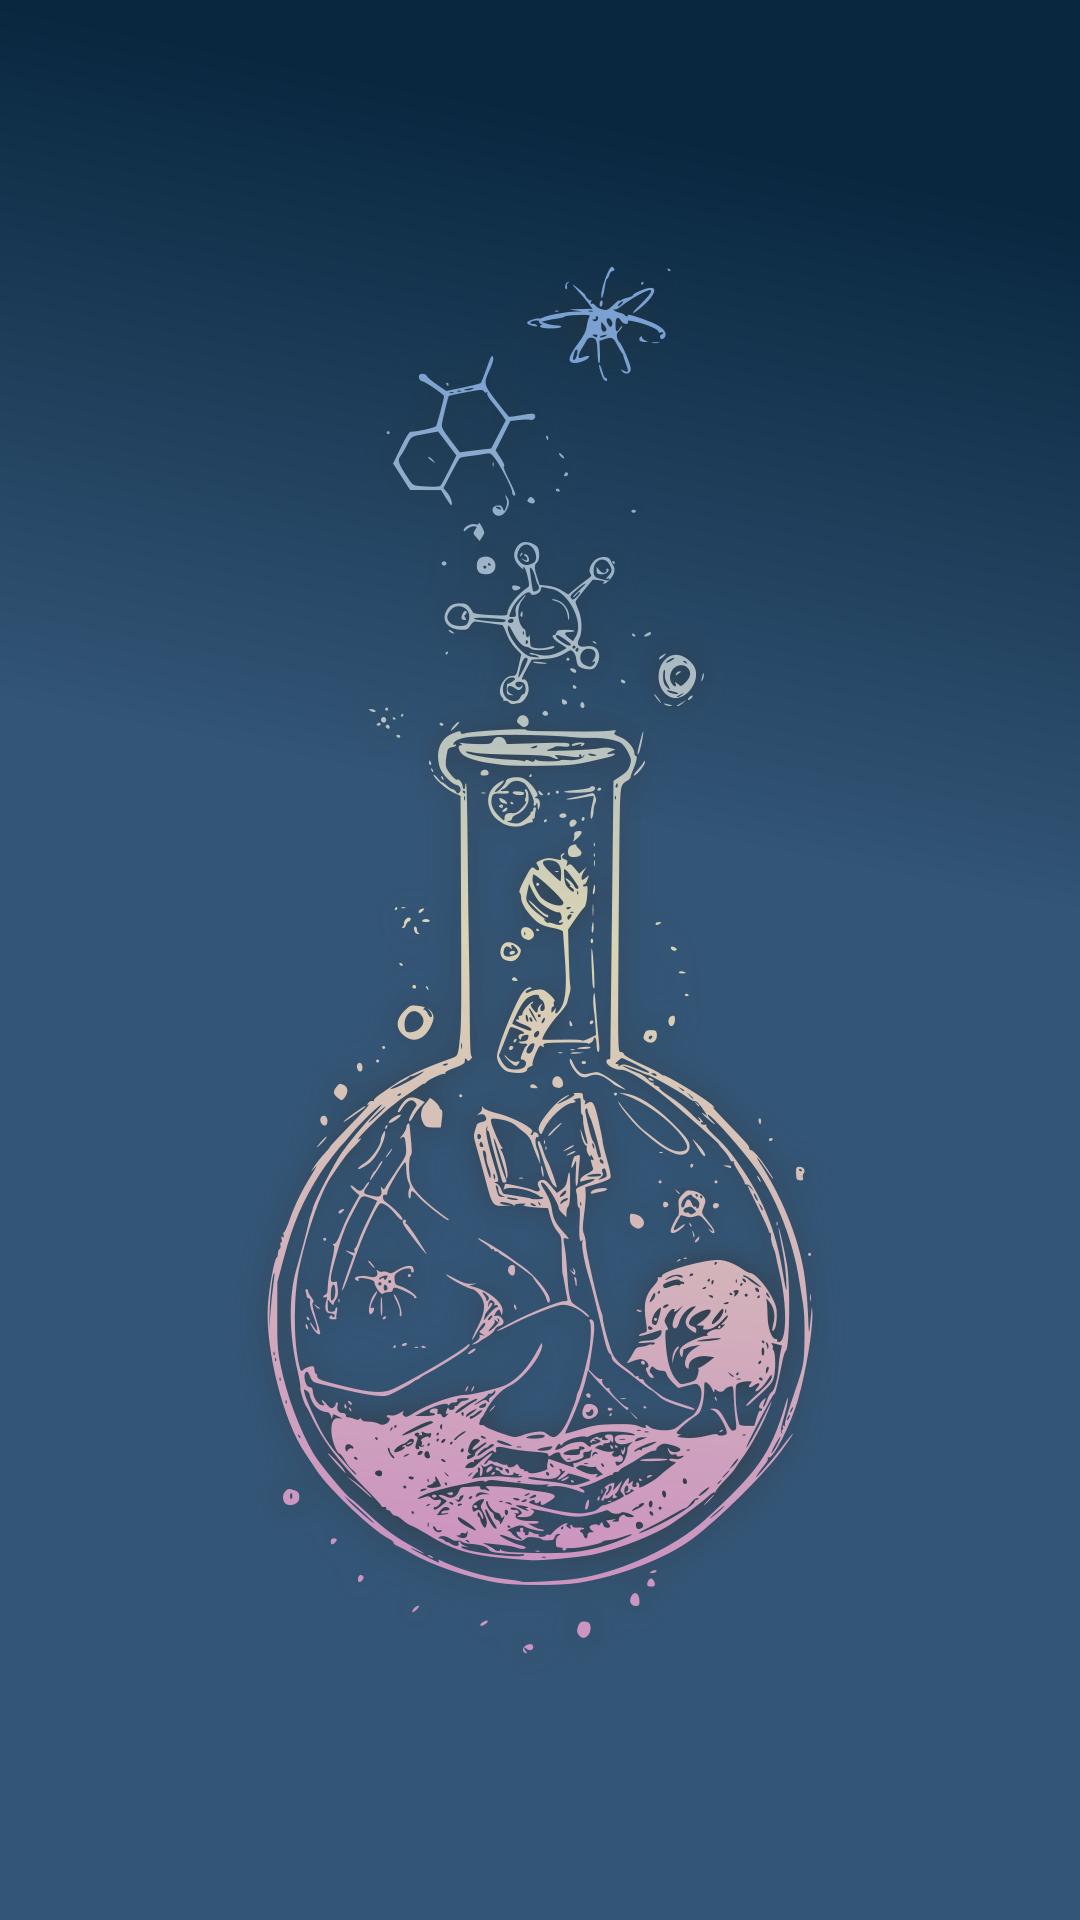 chemist background